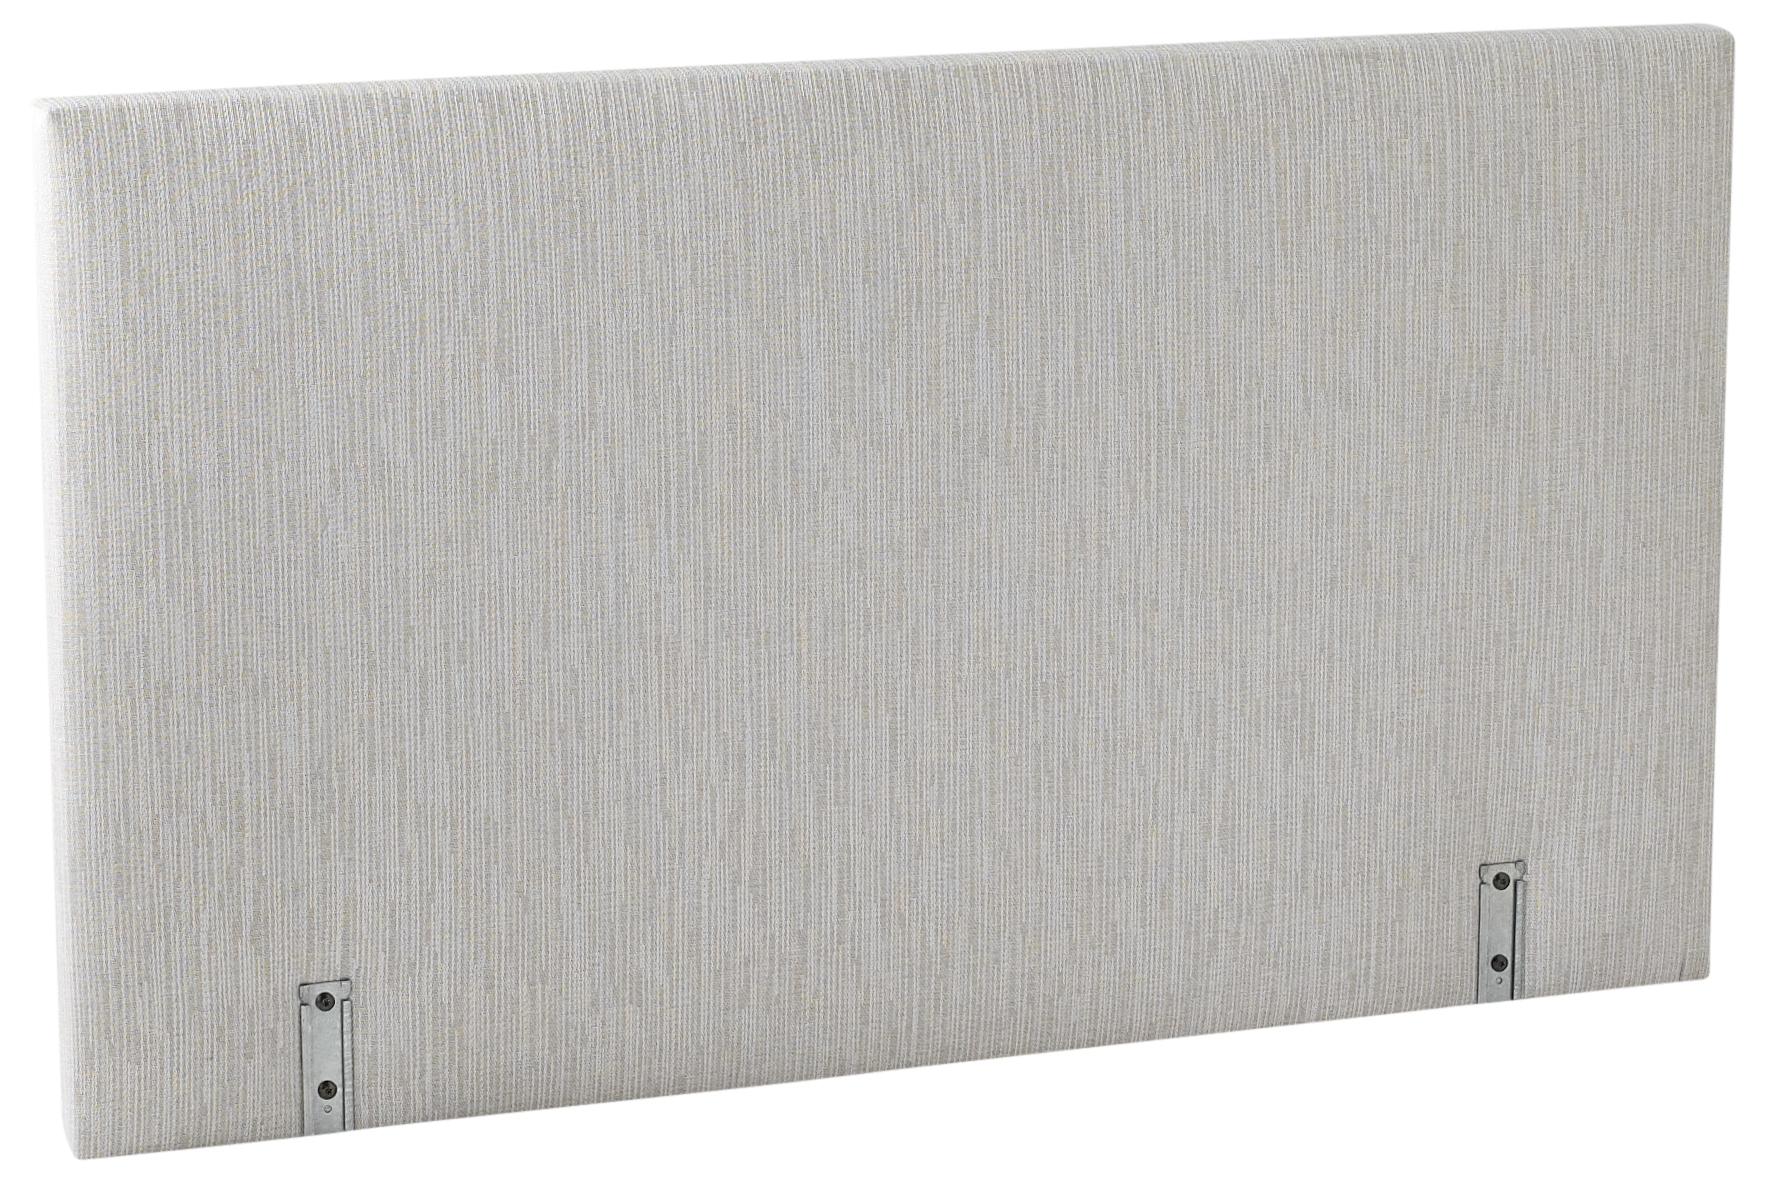 Dosserêt 140 cm Tissu gris clair Relaxima  LesTendancesfr